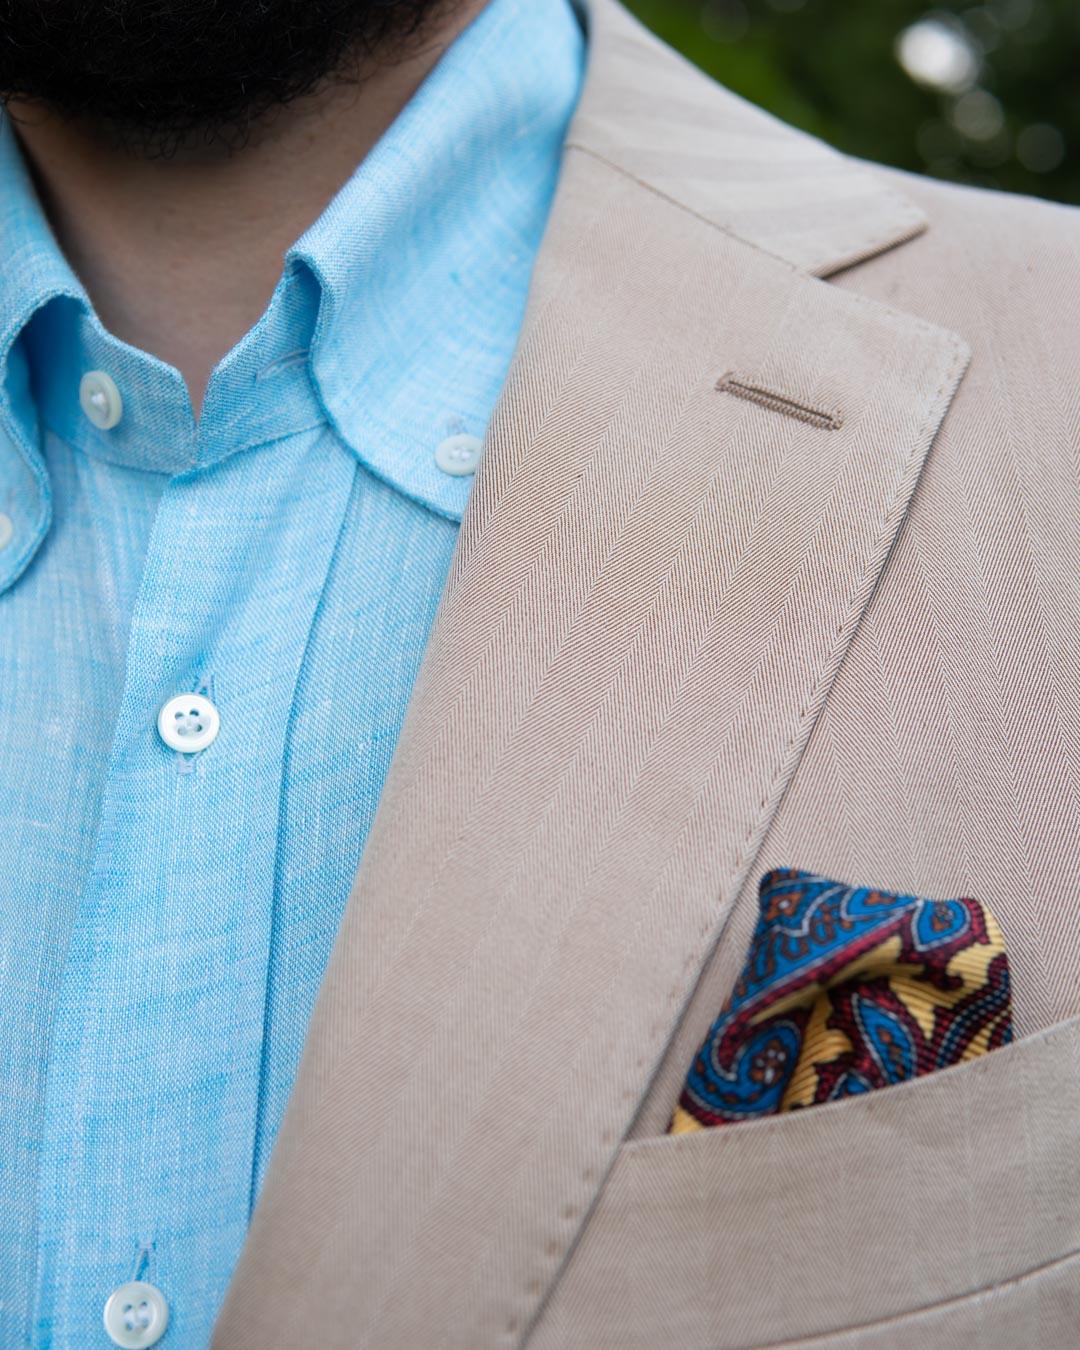 Suitsupply Solaro Suit & Linen Shirt